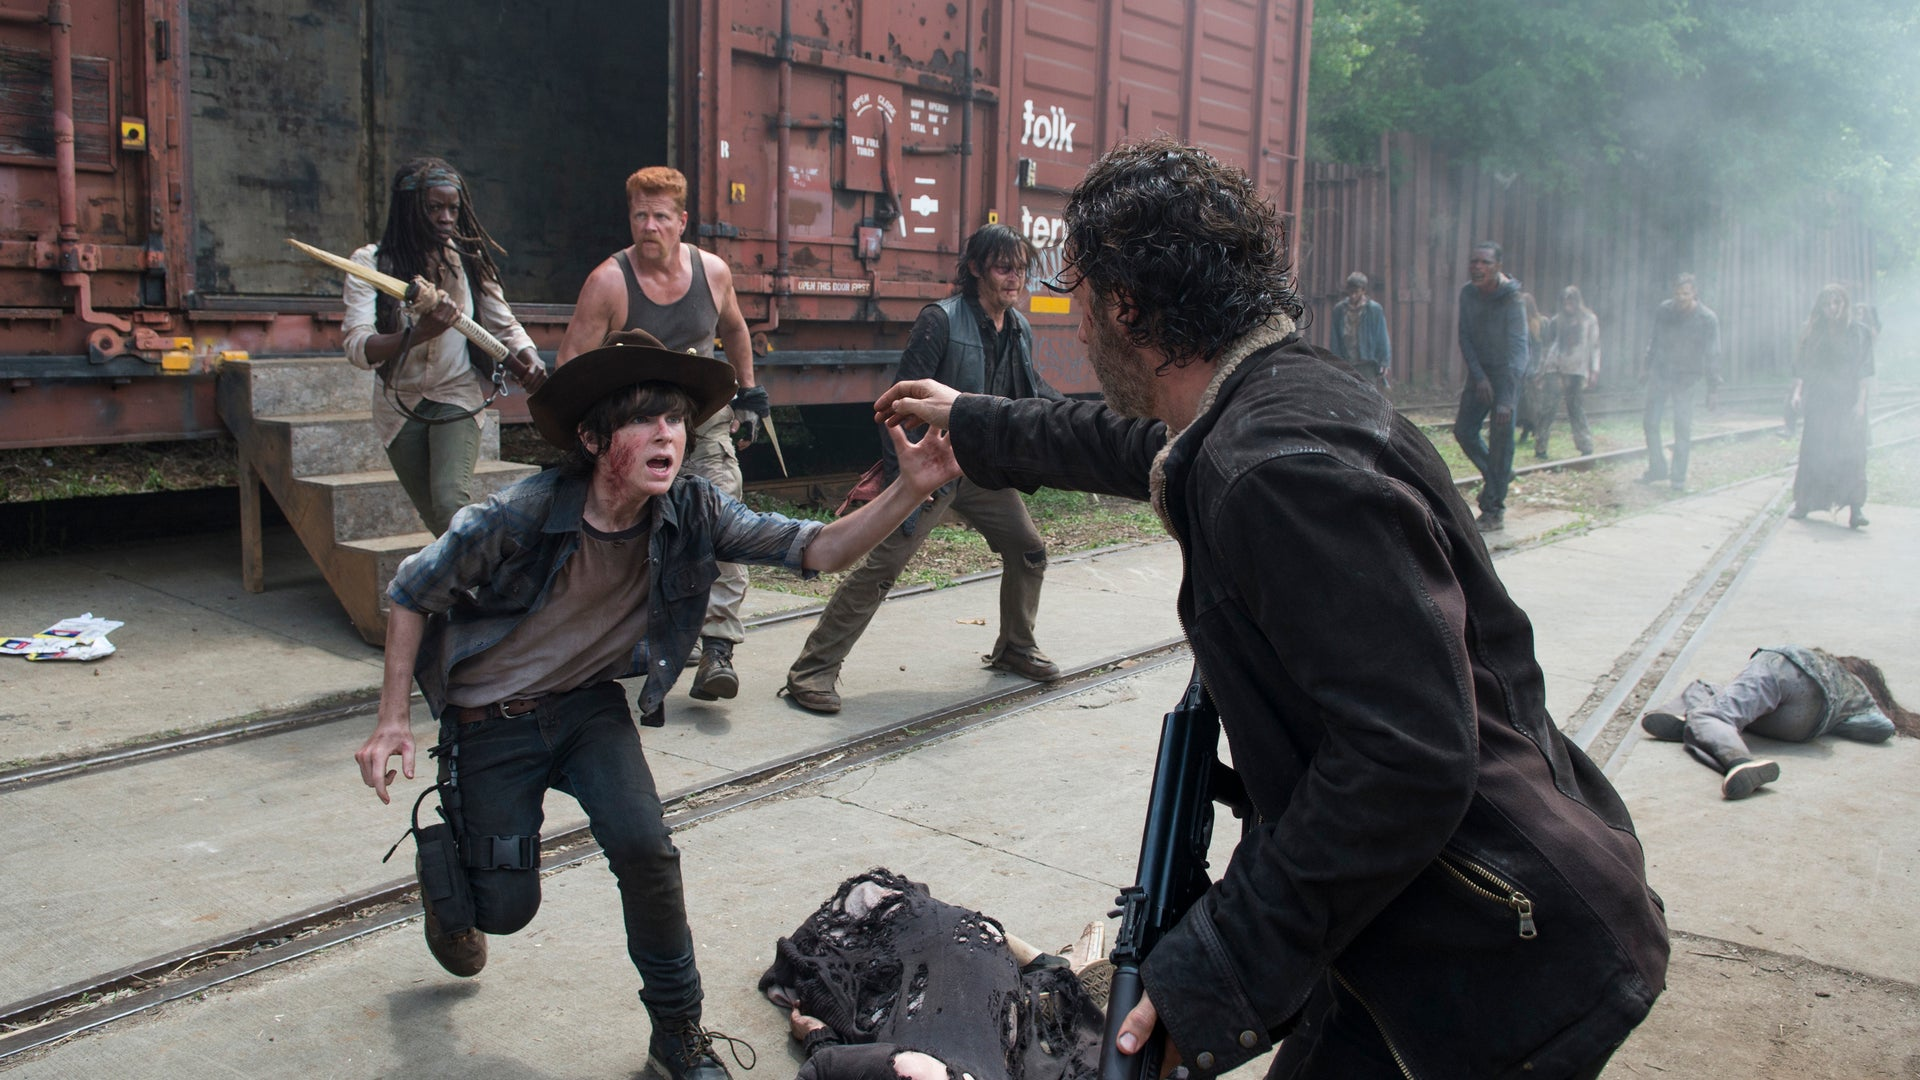 Danai Gurira as Michonne, Michael Cudlitz as Abraham, Norman Reedus as Daryl Dixon, Chandler Riggs as Carl Grimes and Andrew Lincoln as Rick Grimes, The Walking Dead